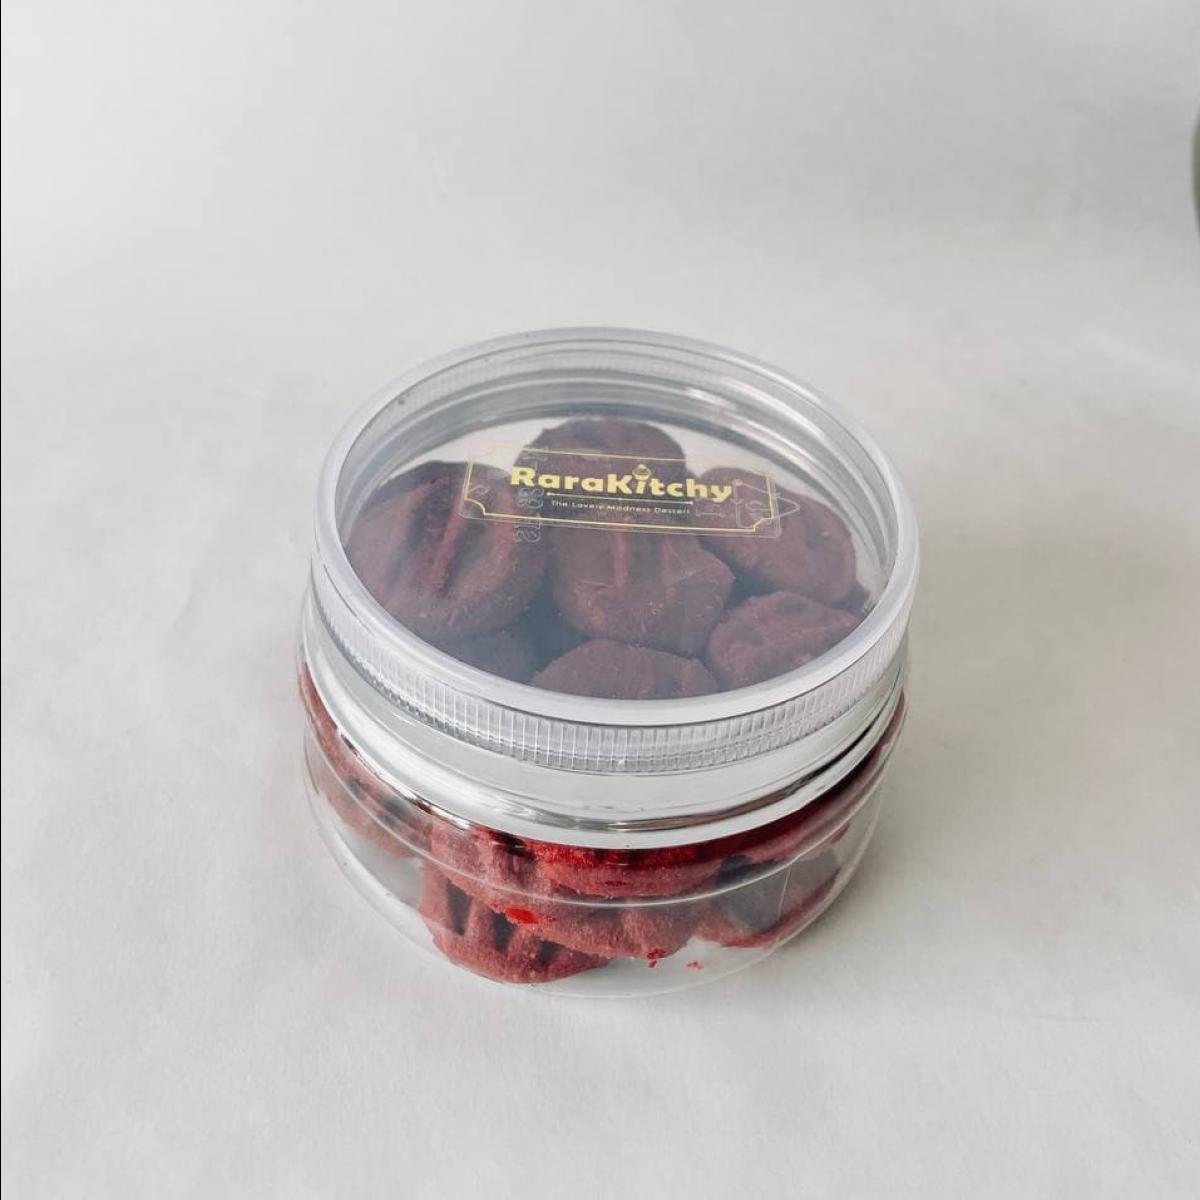 RED VELVET COOKIES (SMALL) - RARA KITCHY